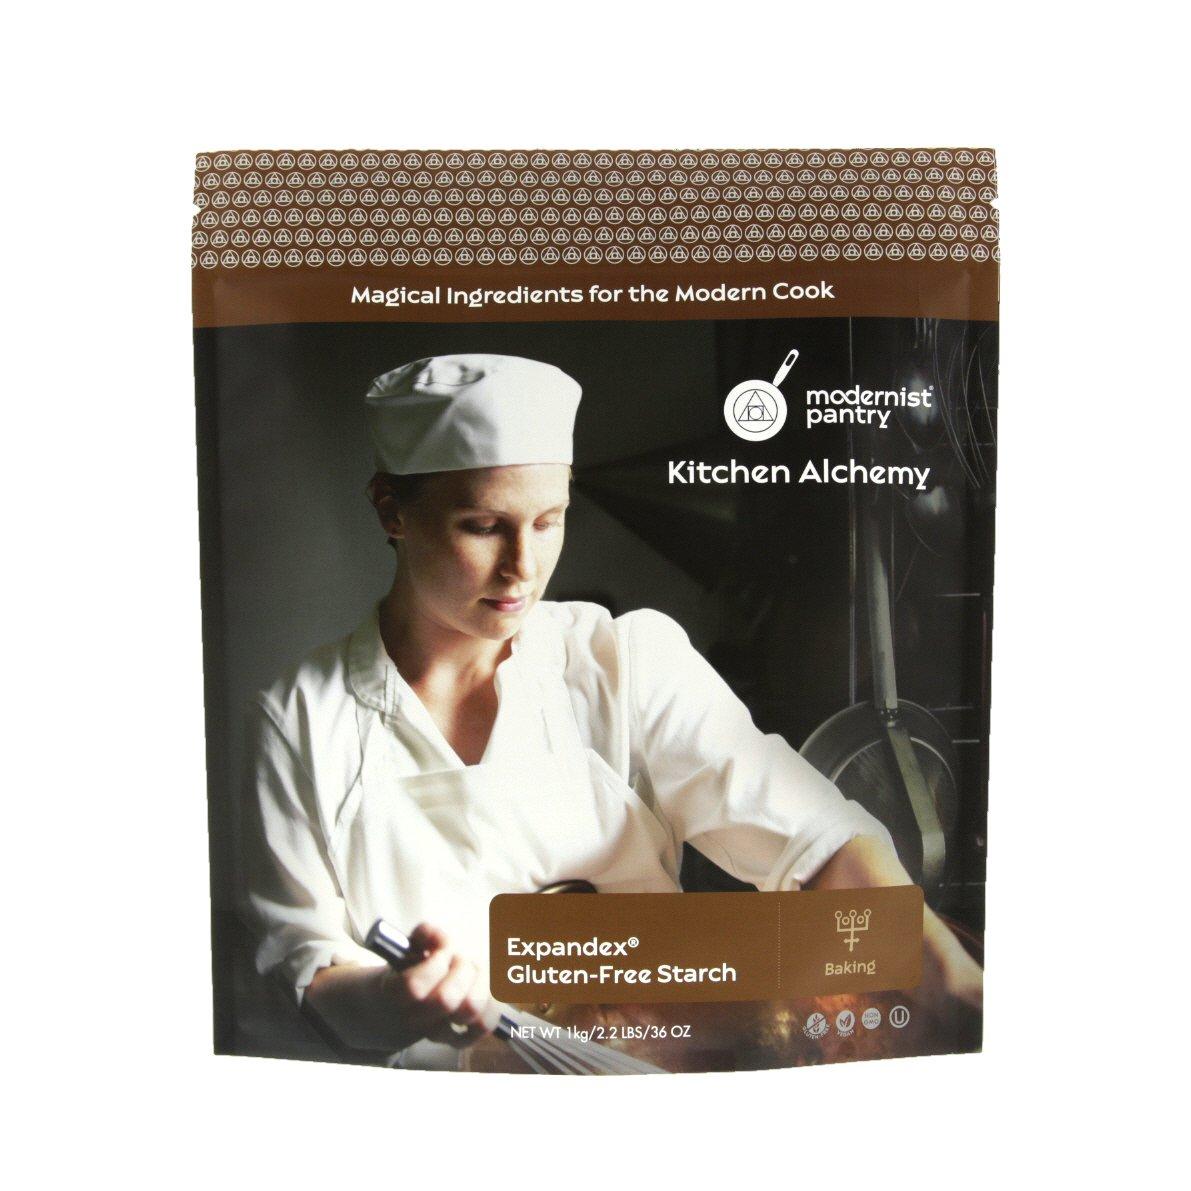 Expandex GF Tapioca Starch - 1kg/2.2lbs/36oz (Gluten-Free Baking) ⊘ Non-GMO ❤ Gluten-Free ☮ Vegan ✡ OU Kosher Certified by Modernist Pantry